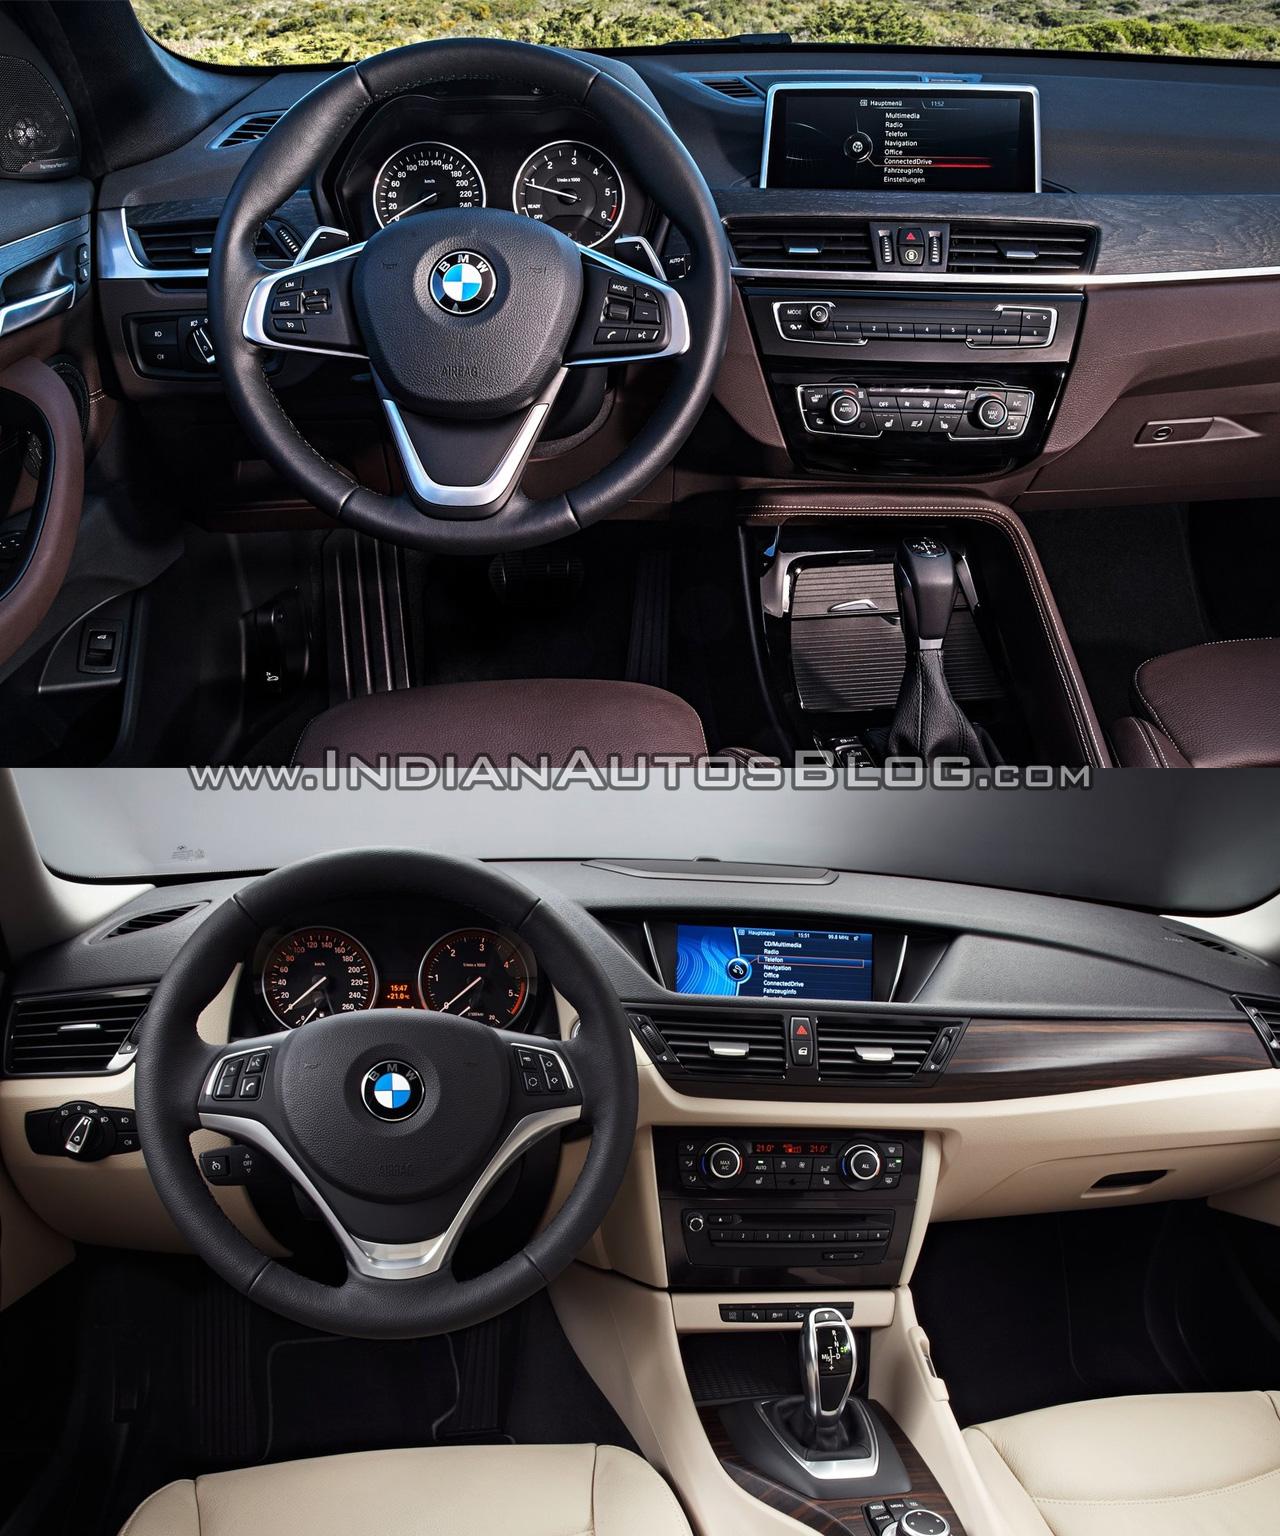 Interni Nuova BMW X1 2015/2016